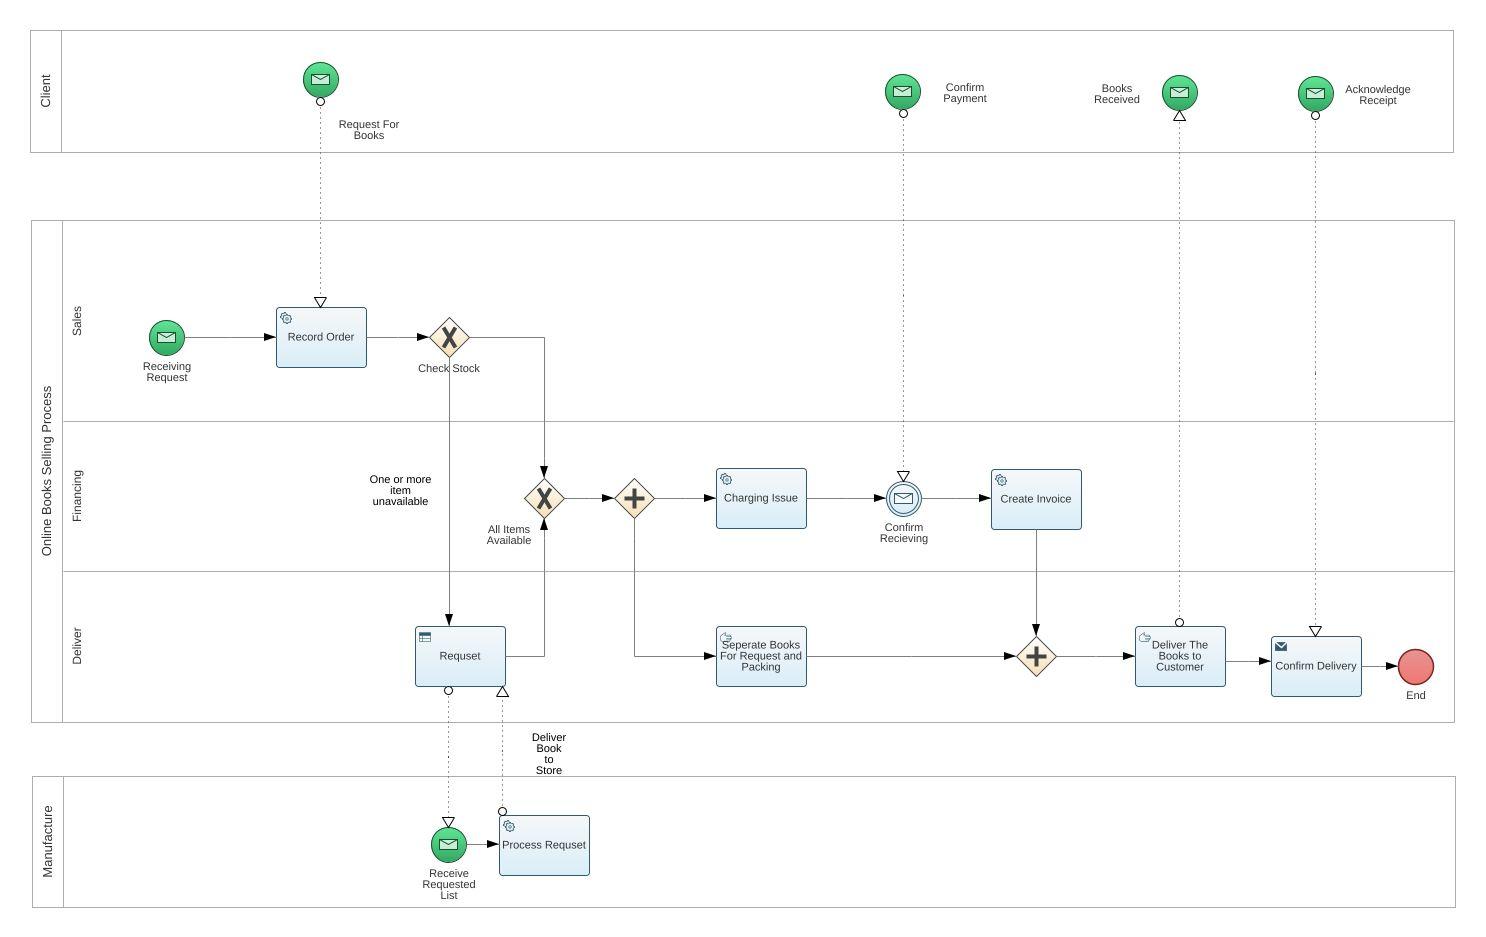 online bpmn diagram online bpmn ice hockey dimensions jpegdownloadtrue online bpmn diagram online bpmnhtml bpmn 20 example pizza training - Bpmn 20 Download